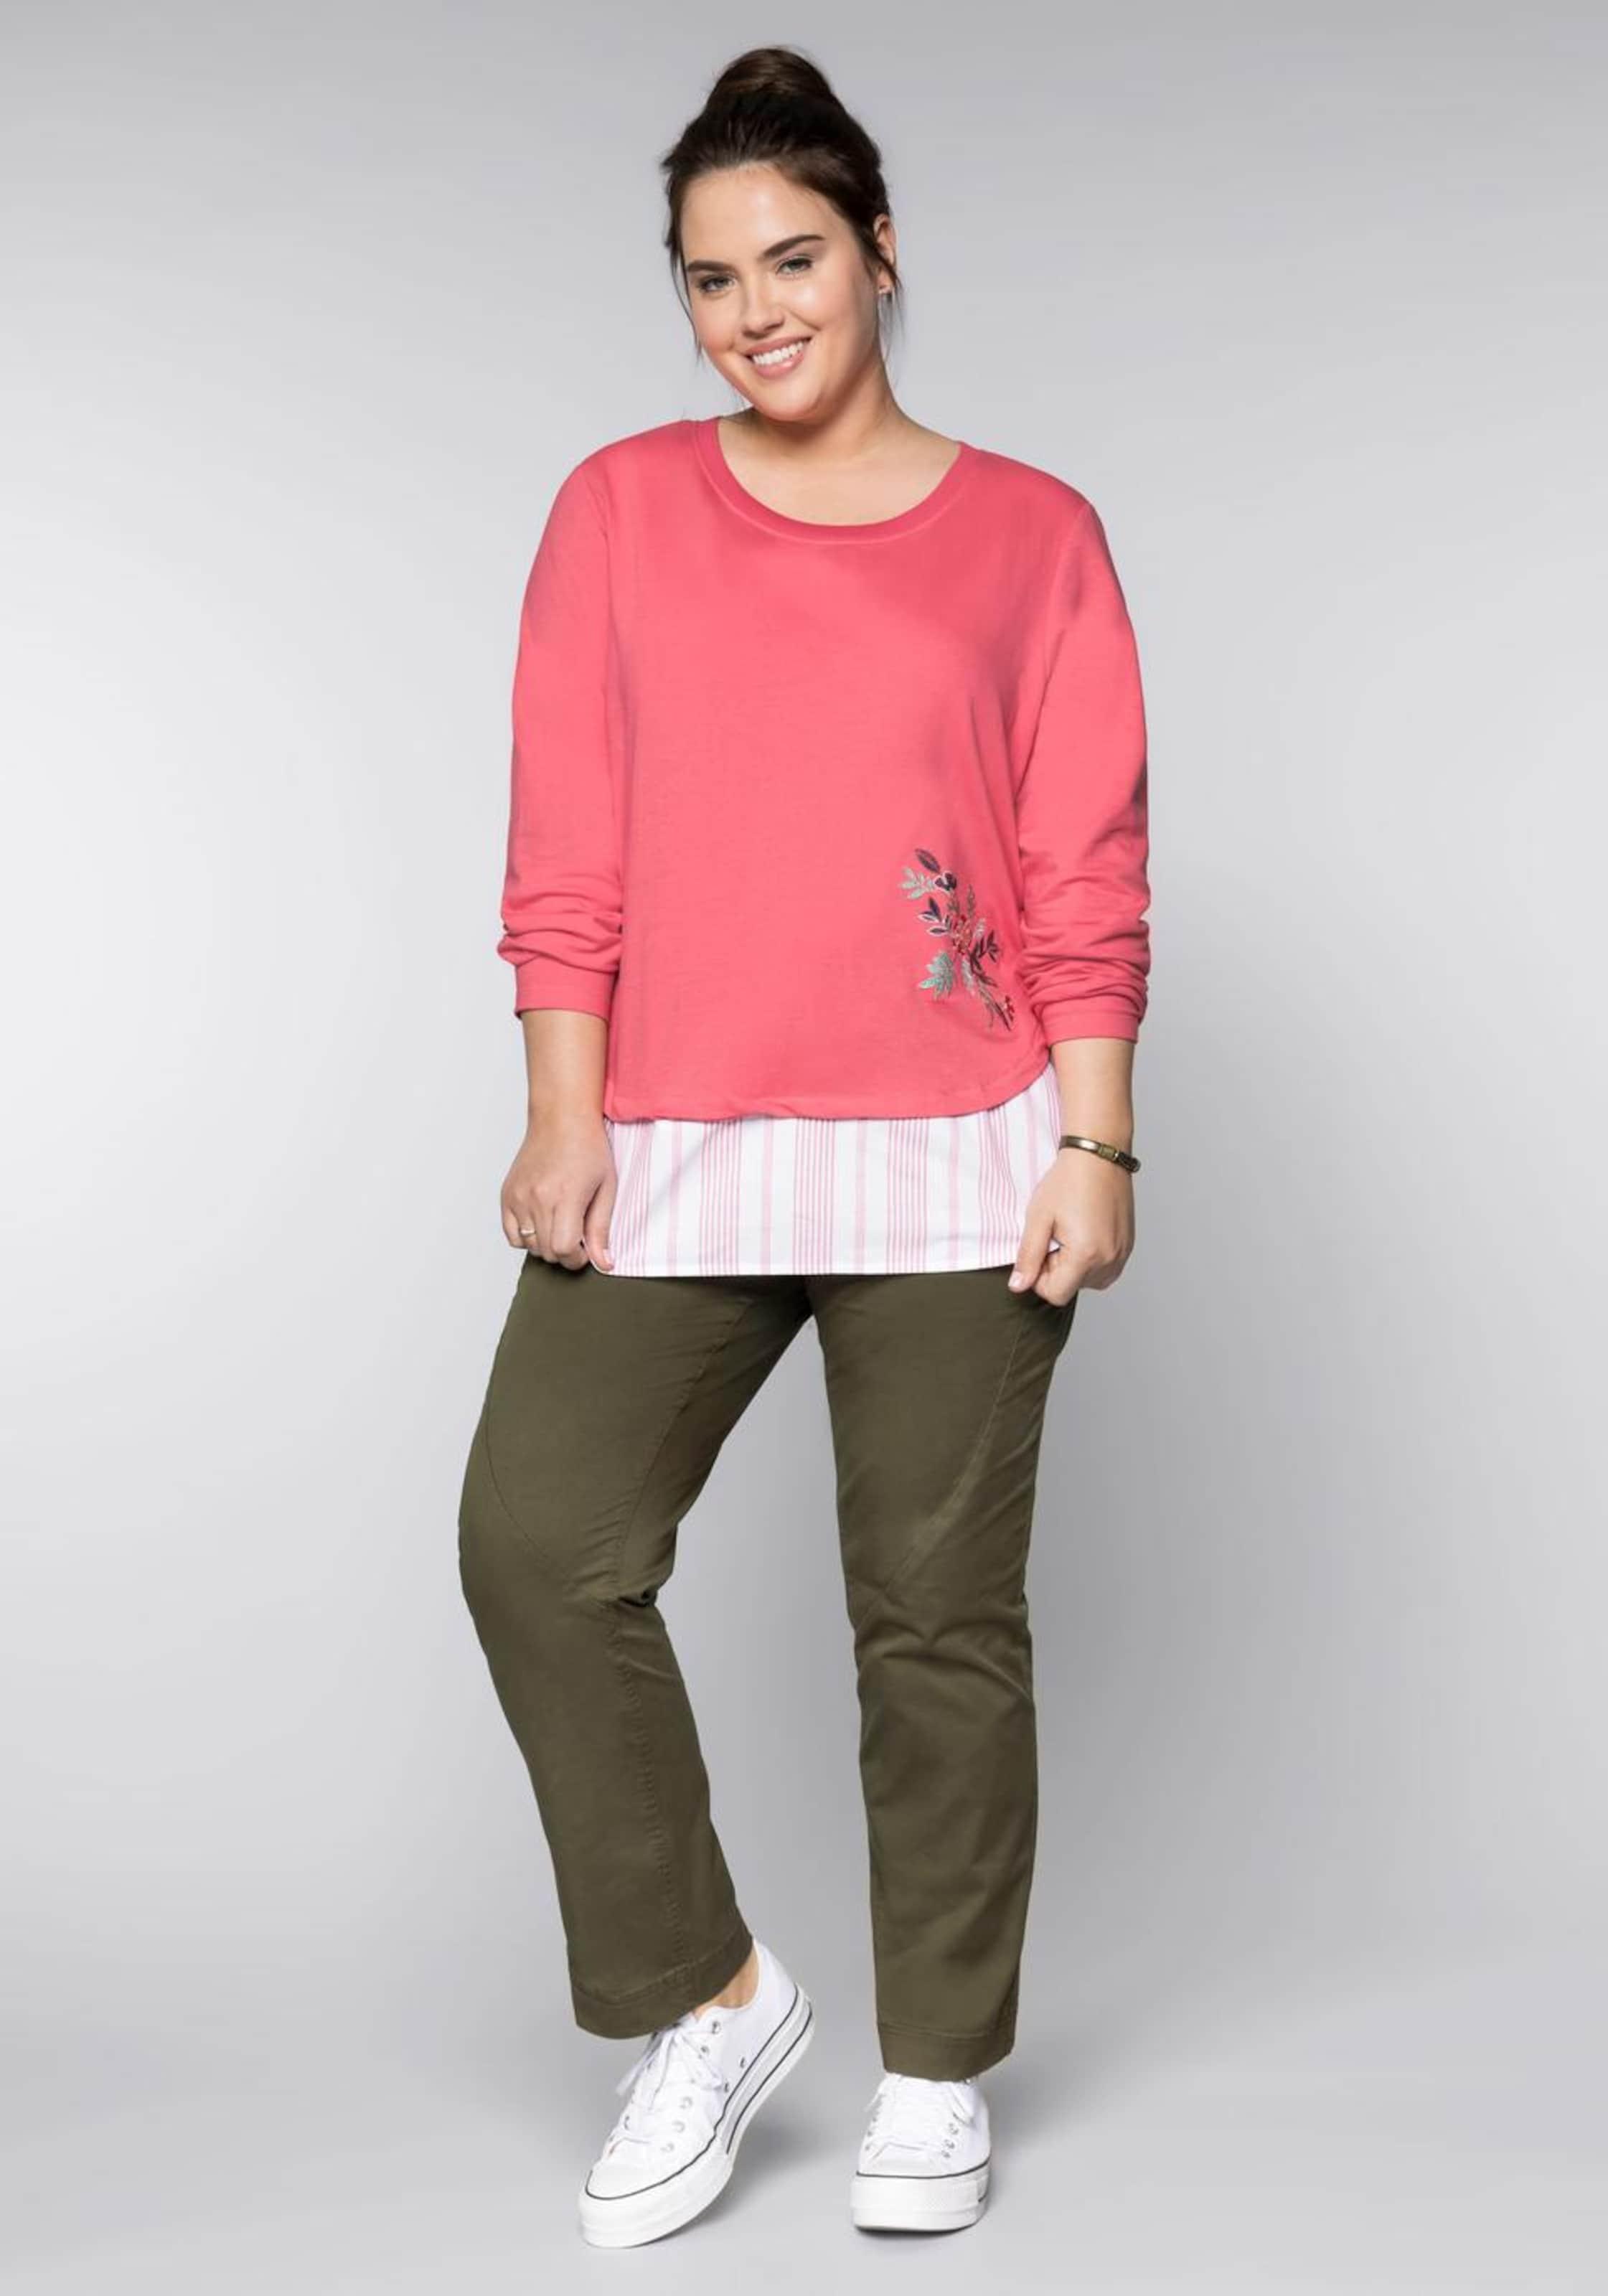 Sweatshirt Sheego In KoralleWeiß Sweatshirt Sheego Sheego In In KoralleWeiß Sweatshirt 7fb6gy